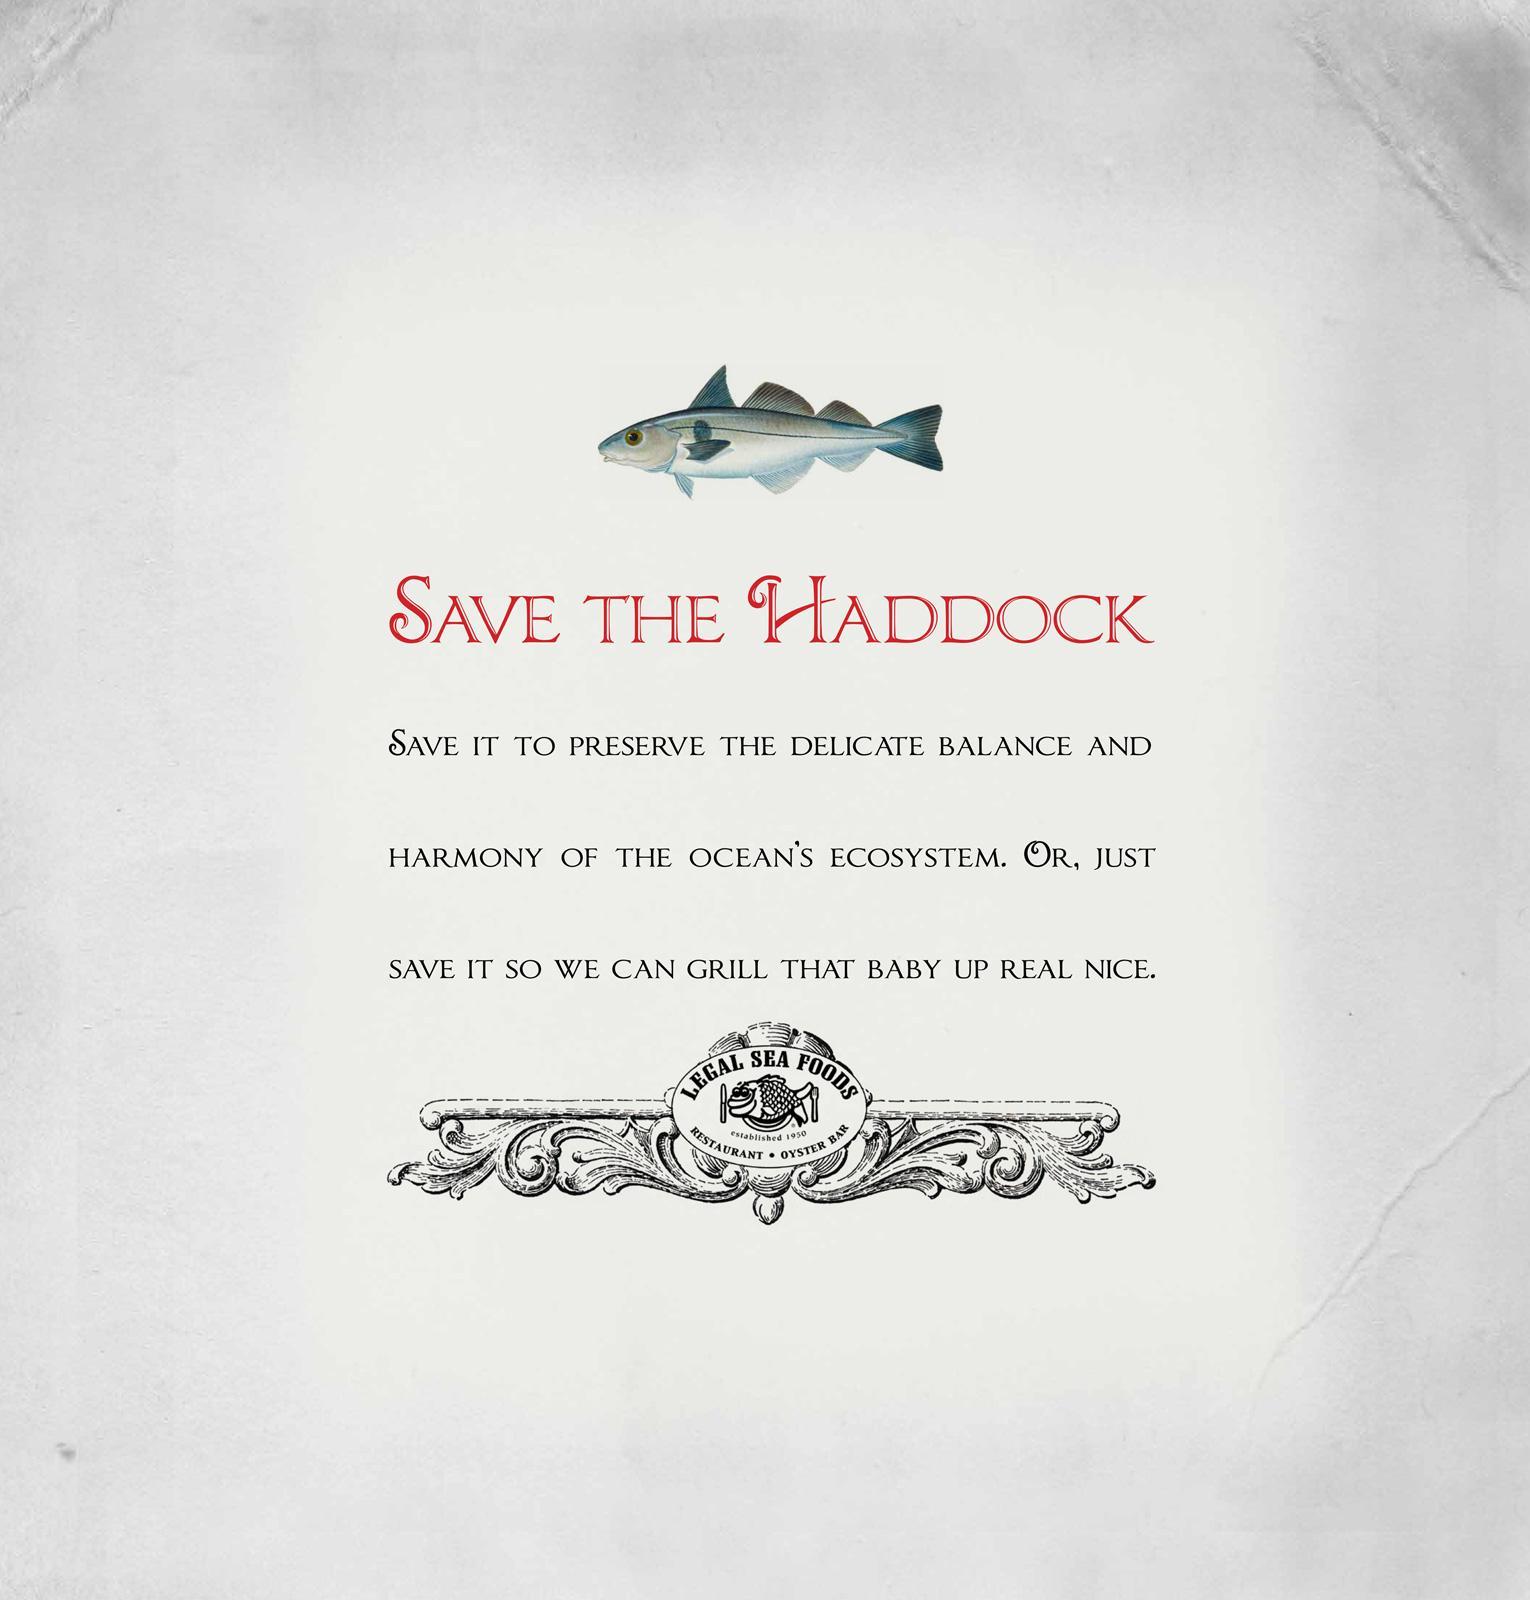 Legal Sea Foods Print Ad -  Save the Haddock